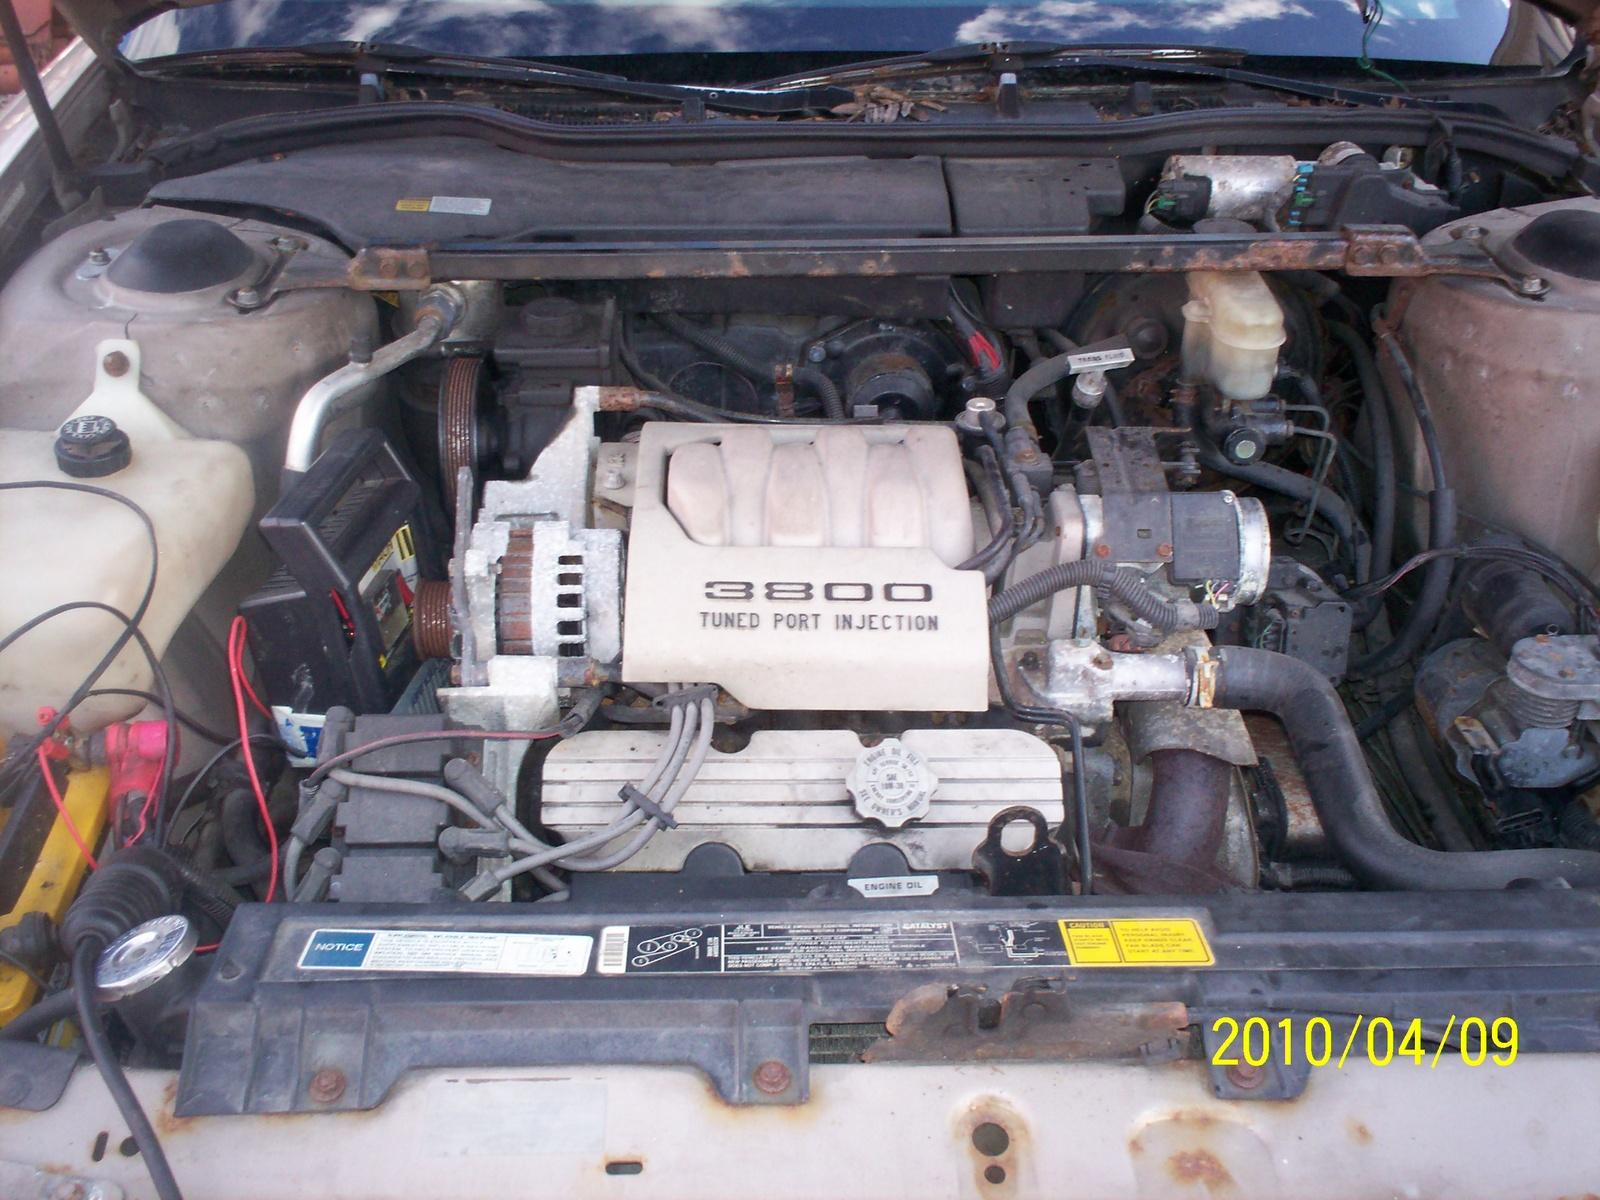 1996 Buick Park Avenue Engine Diagram 1998 Wiring 2002 Vehicle Diagrams Rh Eklablog Co 1995